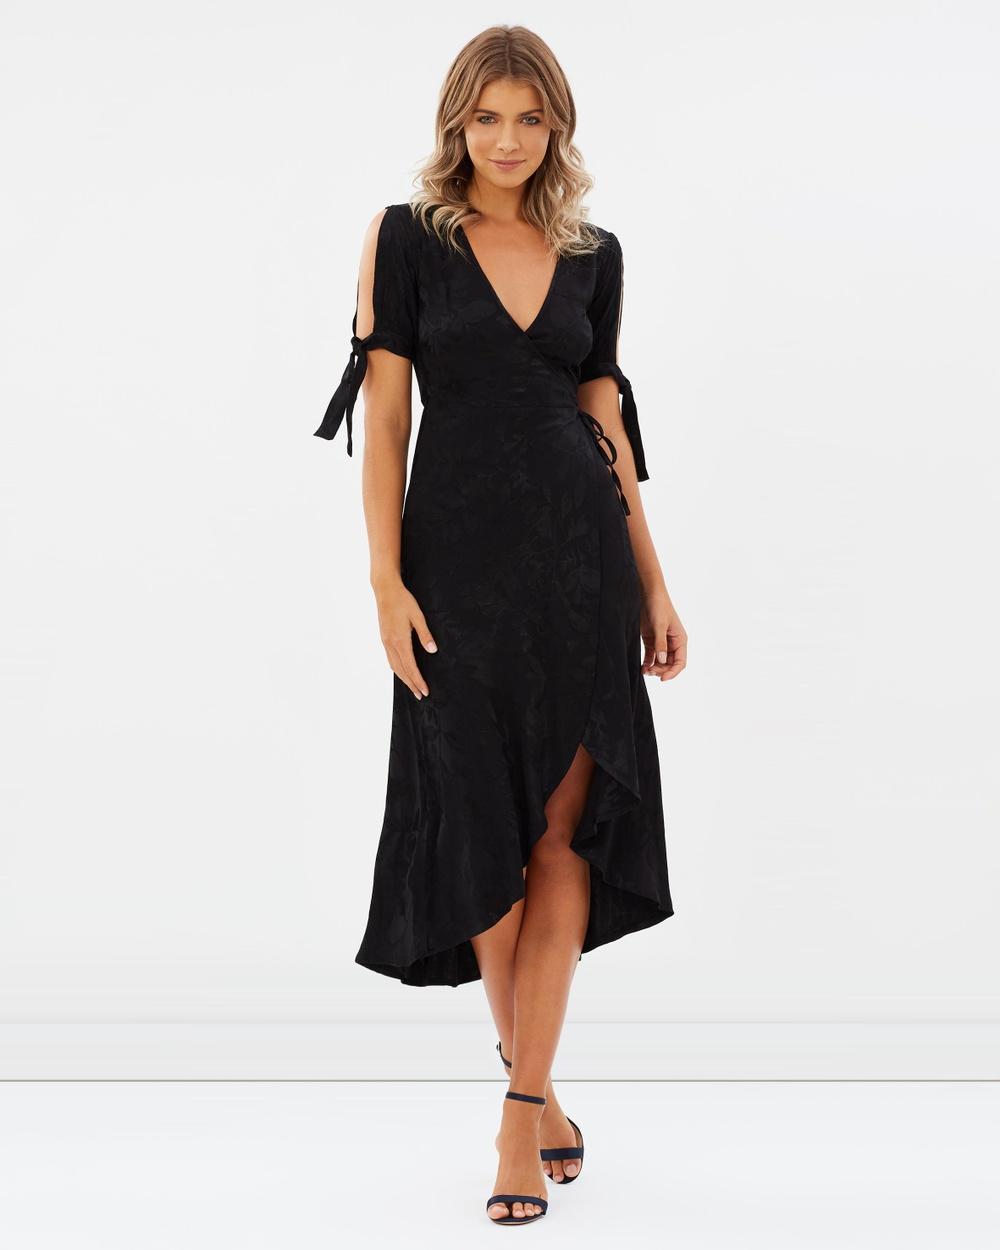 Atmos & Here ICONIC EXCLUSIVE Malta Midi Wrap Dress Dresses Black ICONIC EXCLUSIVE Malta Midi Wrap Dress